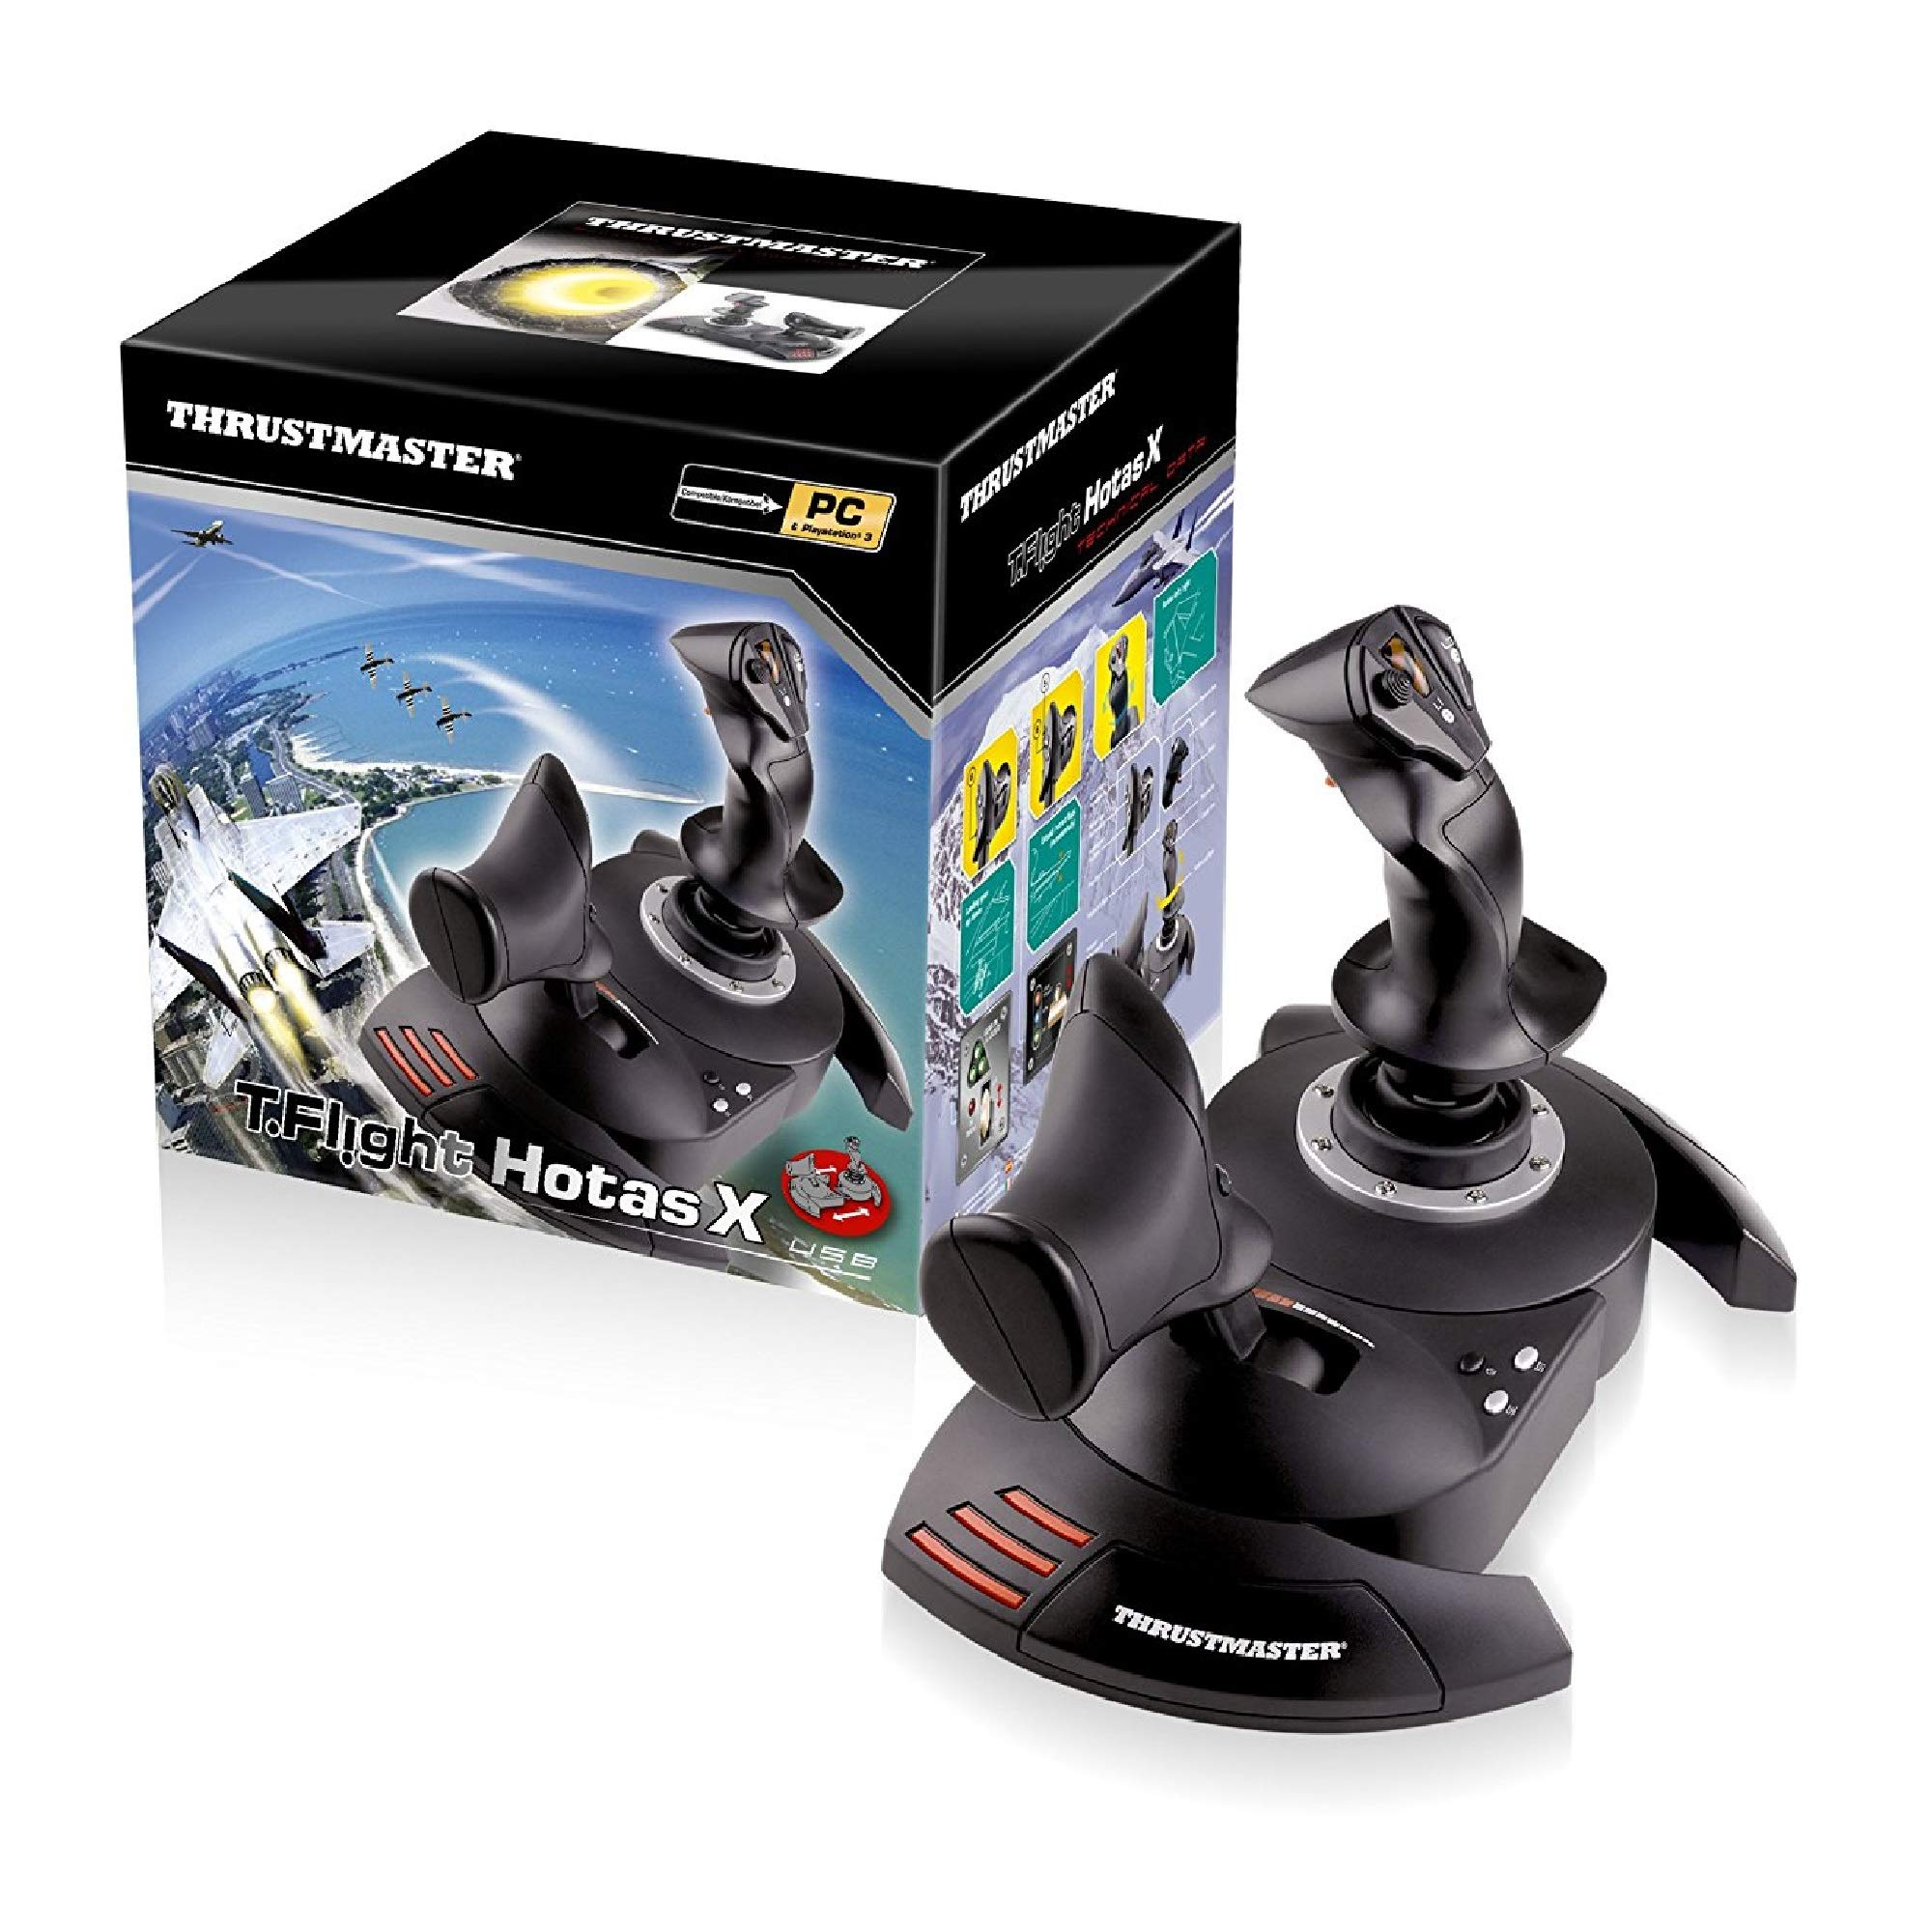 Thrustmaster T-Flight Hotas X Flight Stick by Thrustmaster (Image #4)